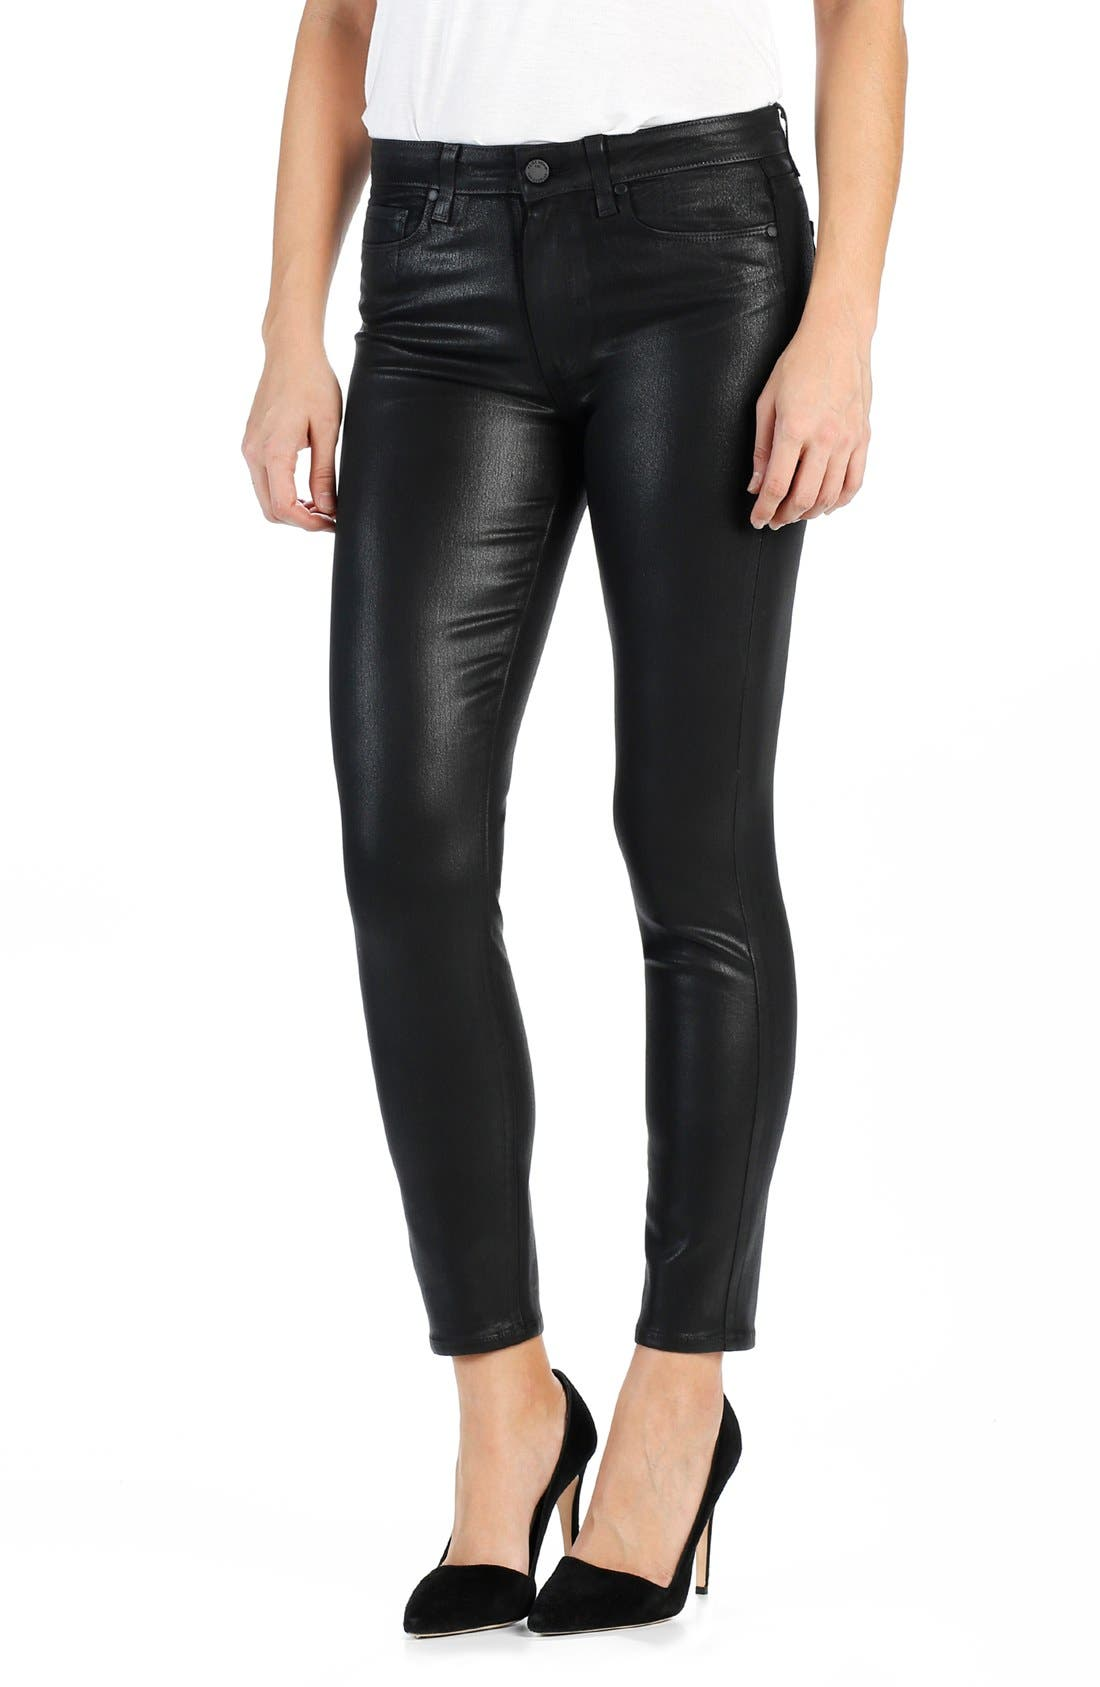 High waisted black coated skinny jeans